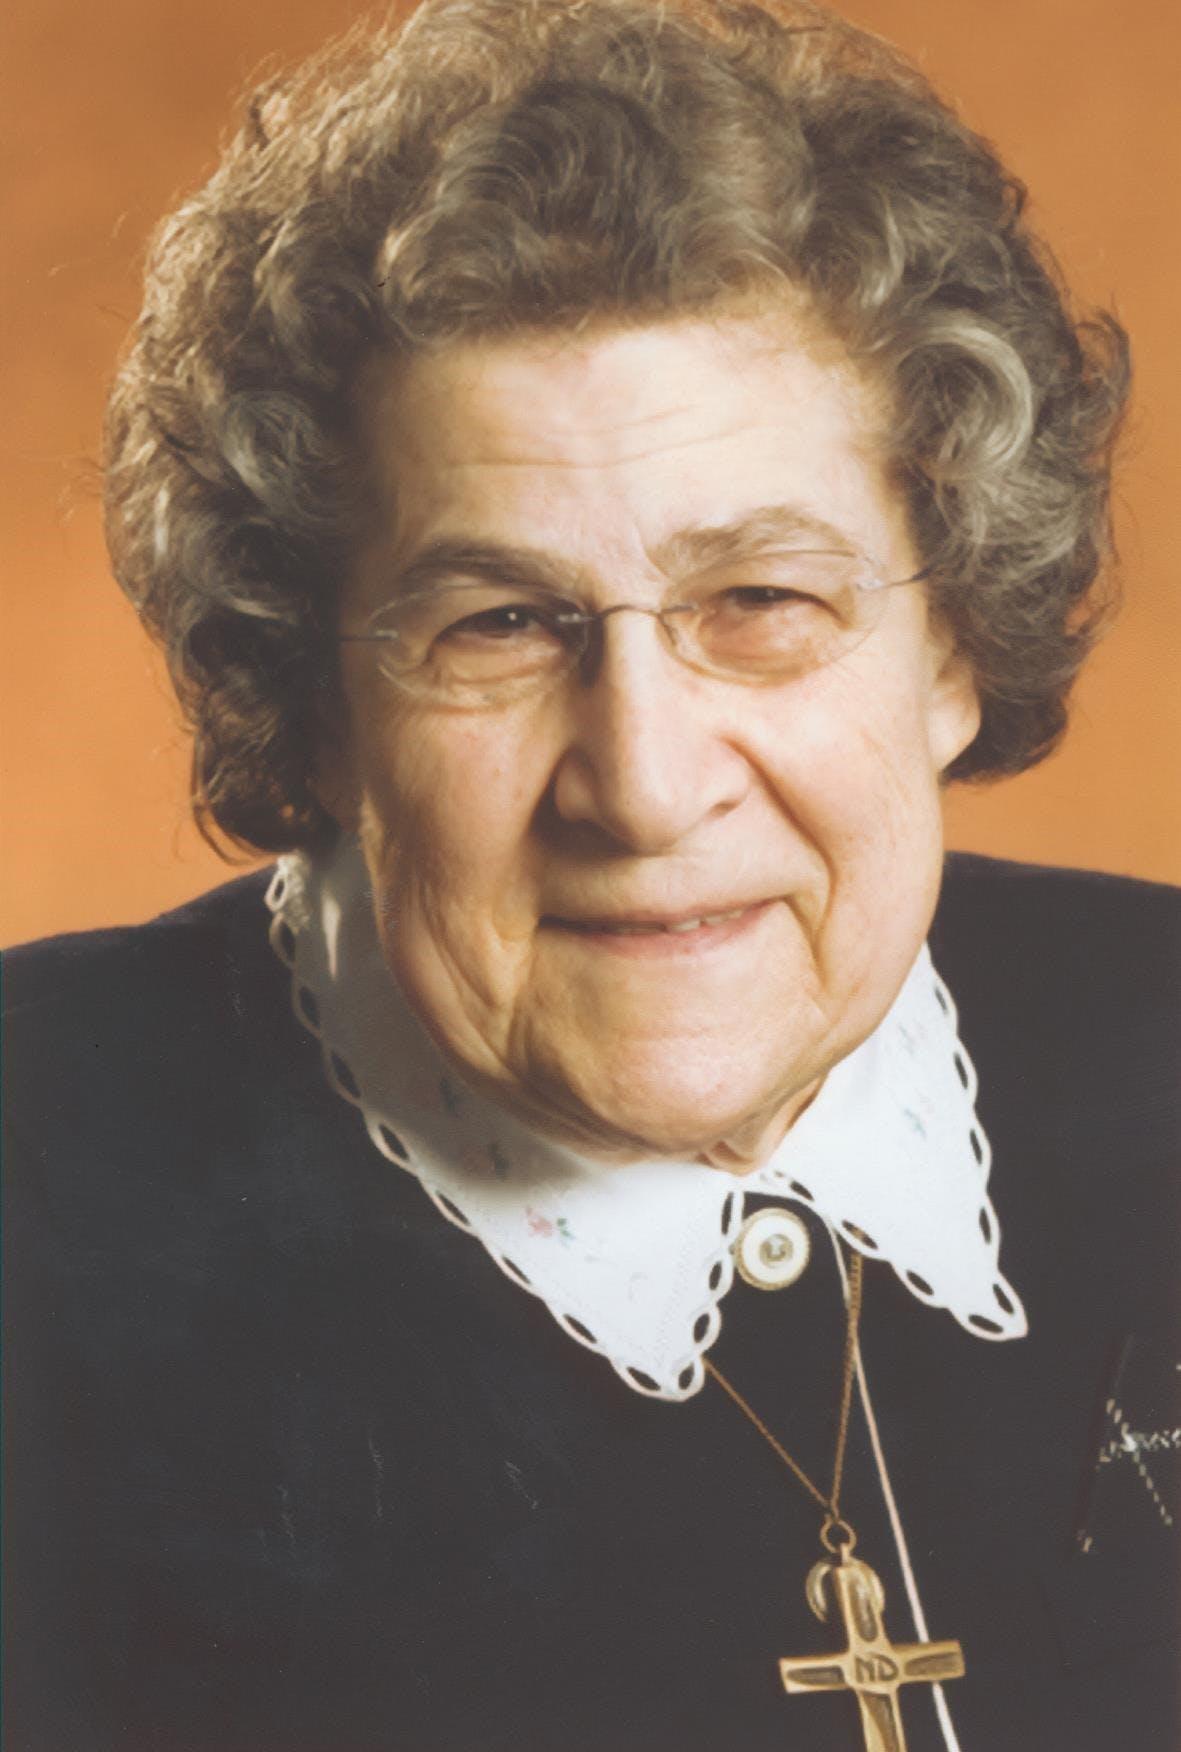 Sister Mary Josephine D'Amico